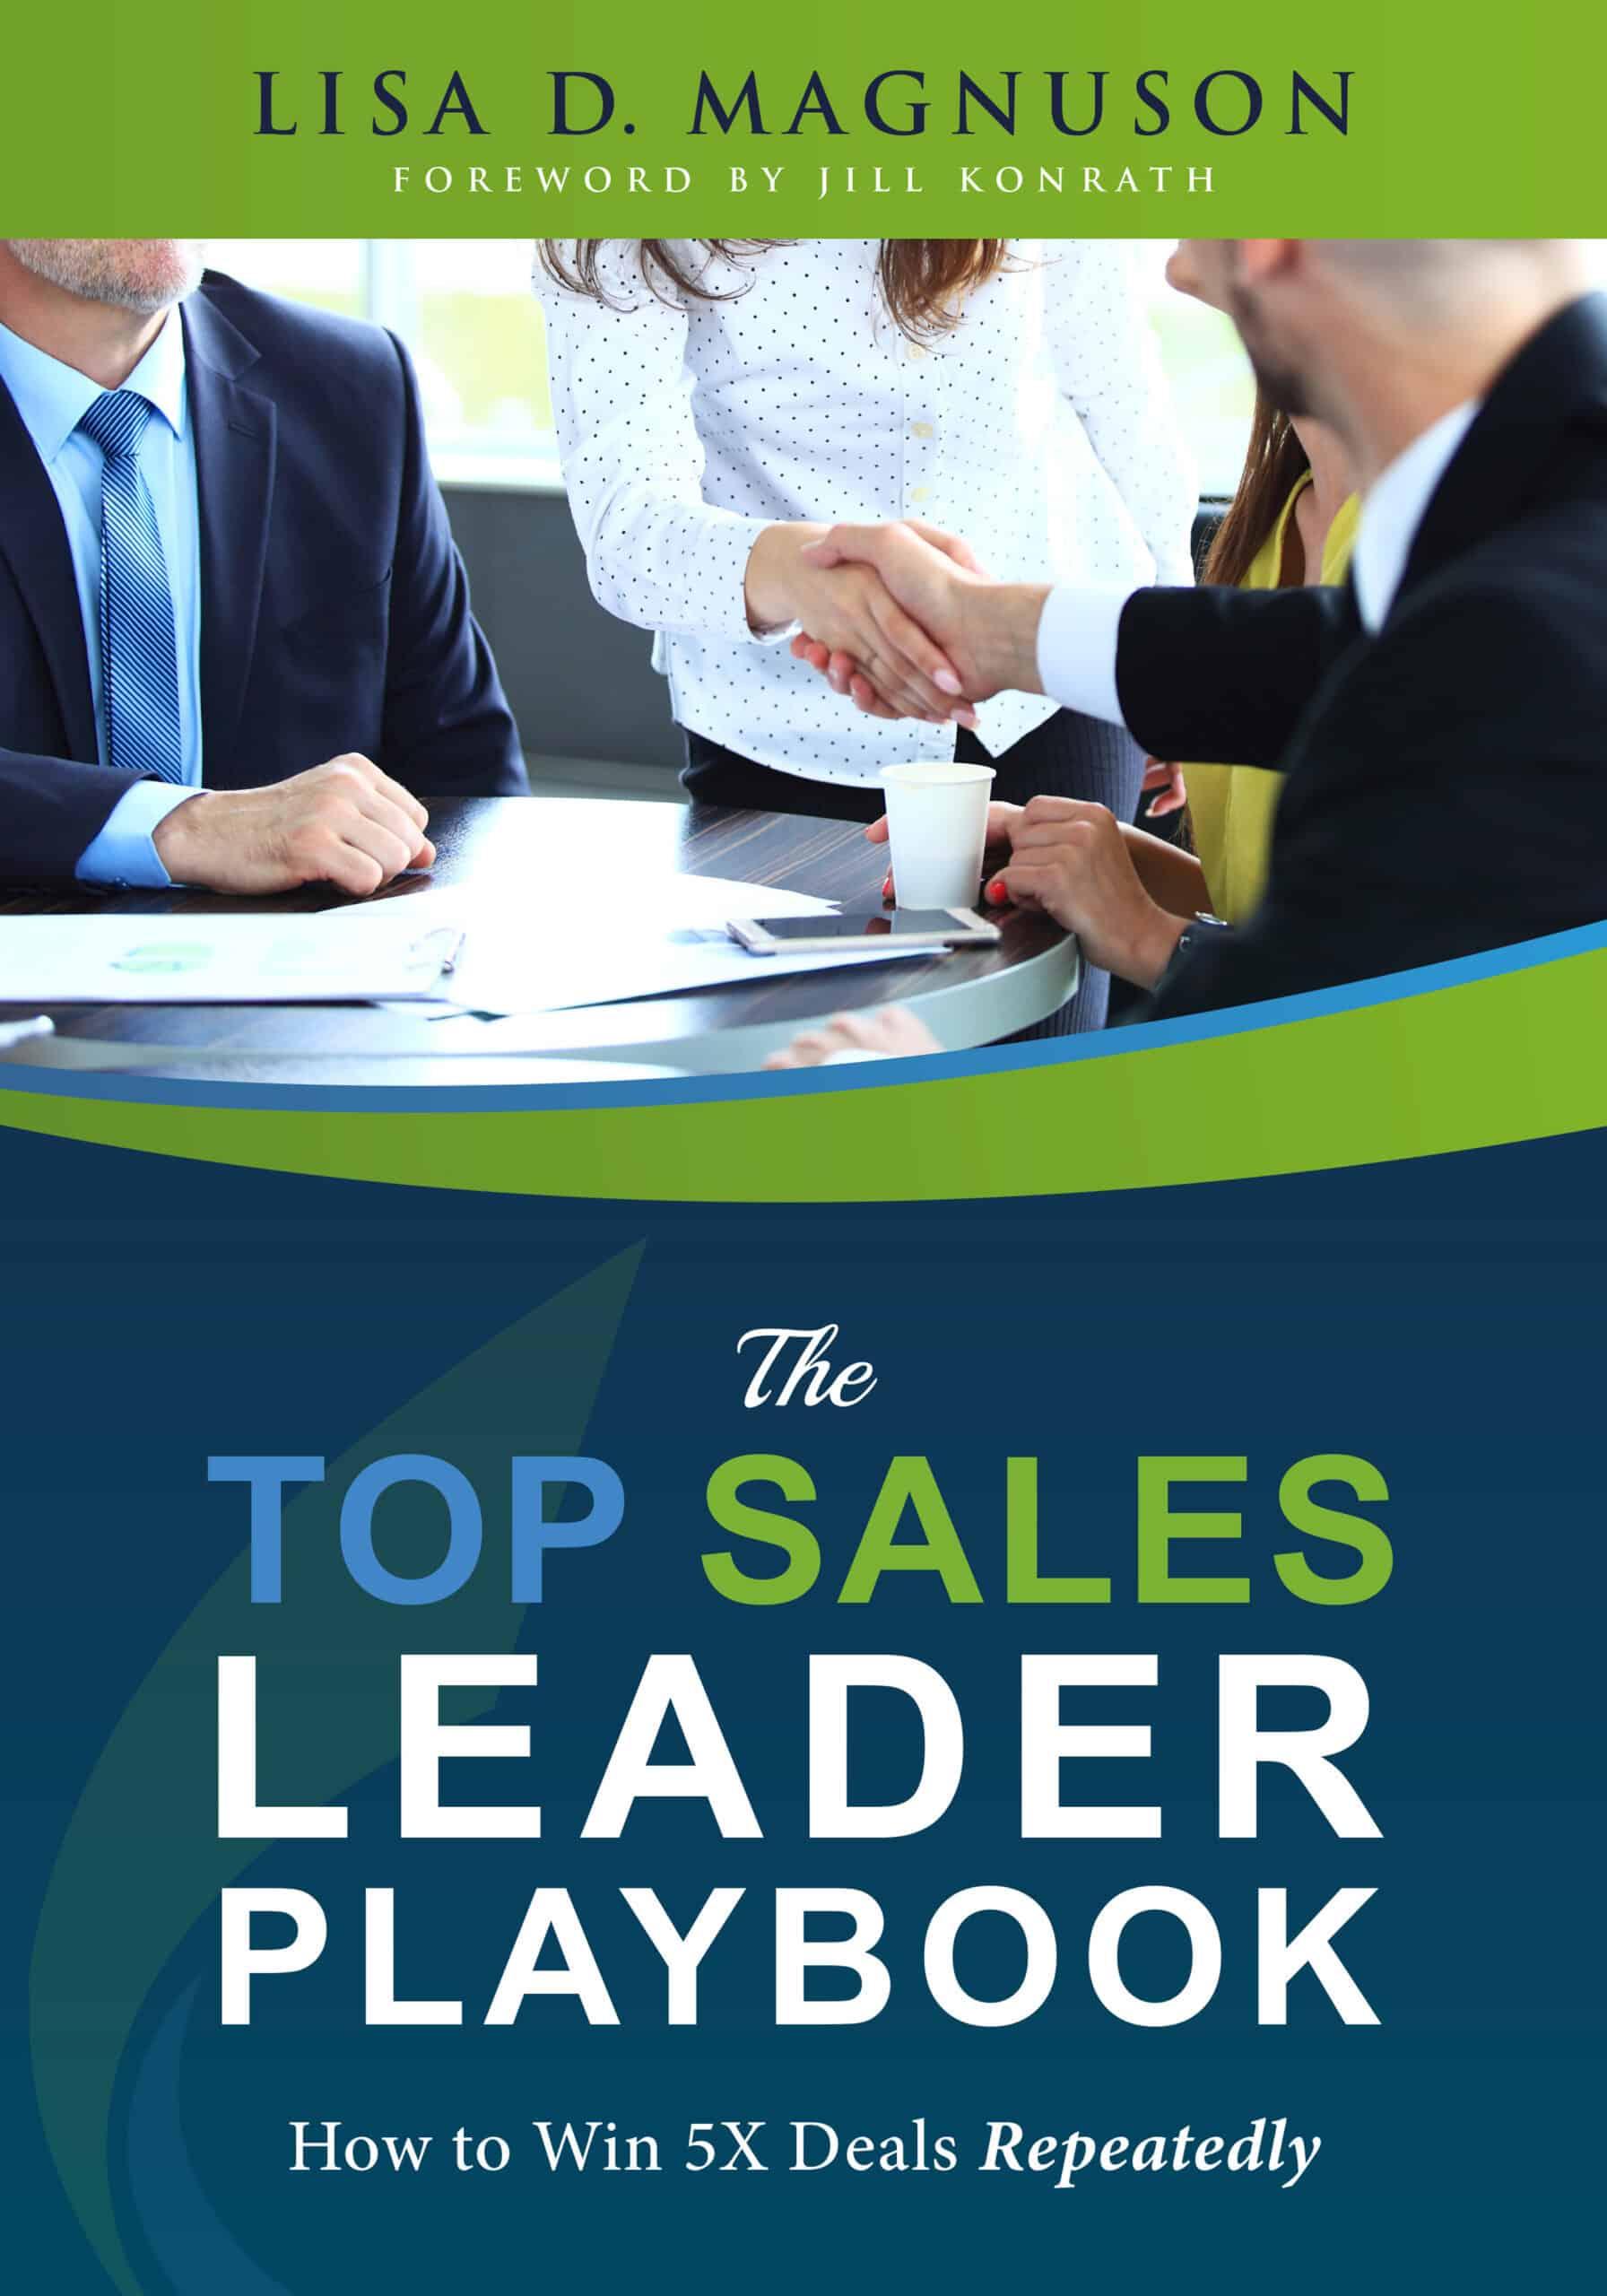 Top Sales Leader Playbook Cover